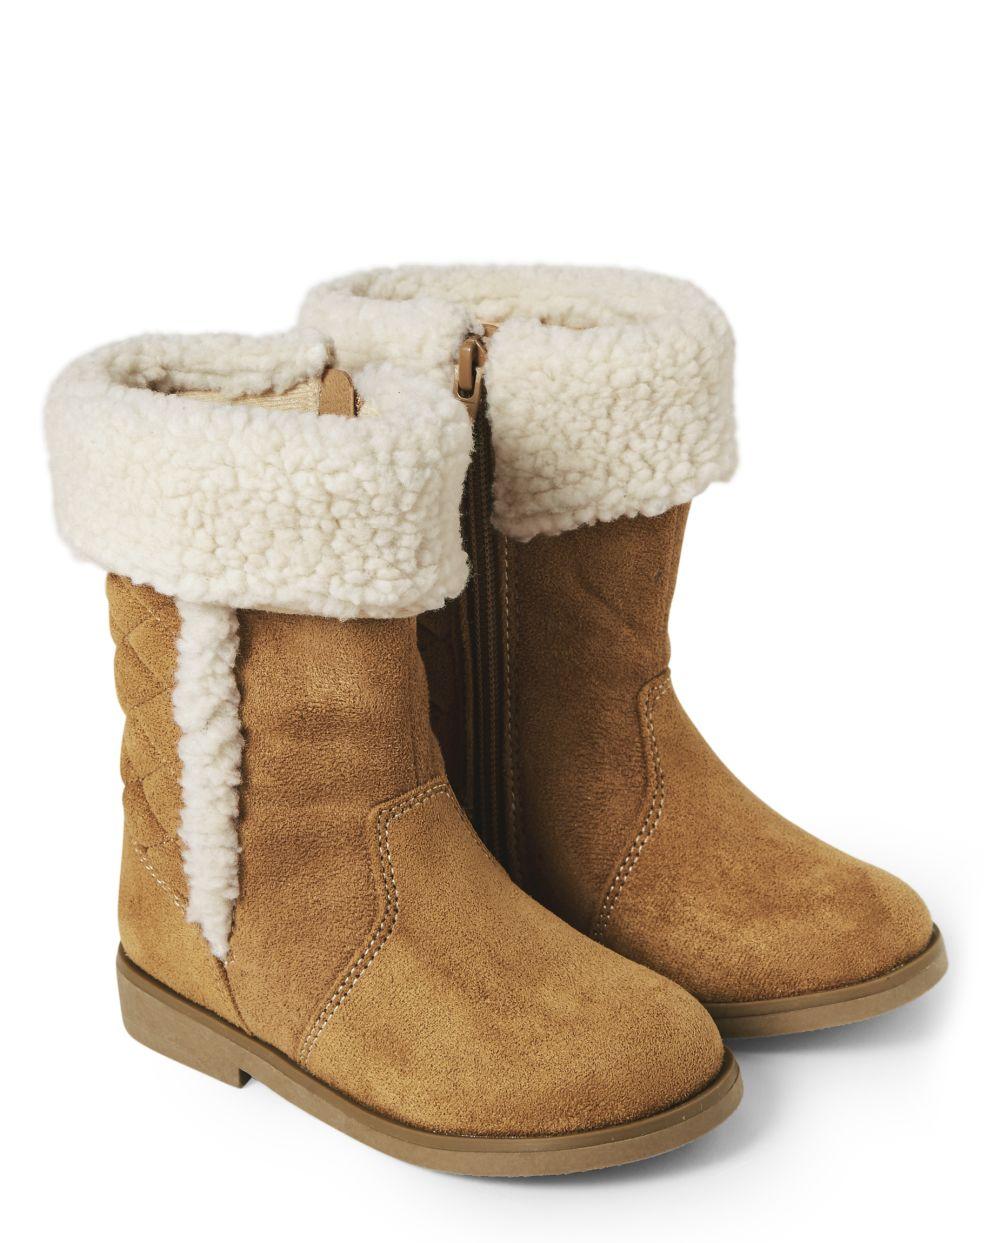 Girls Quilted Tall Boots - Winter Wonderland